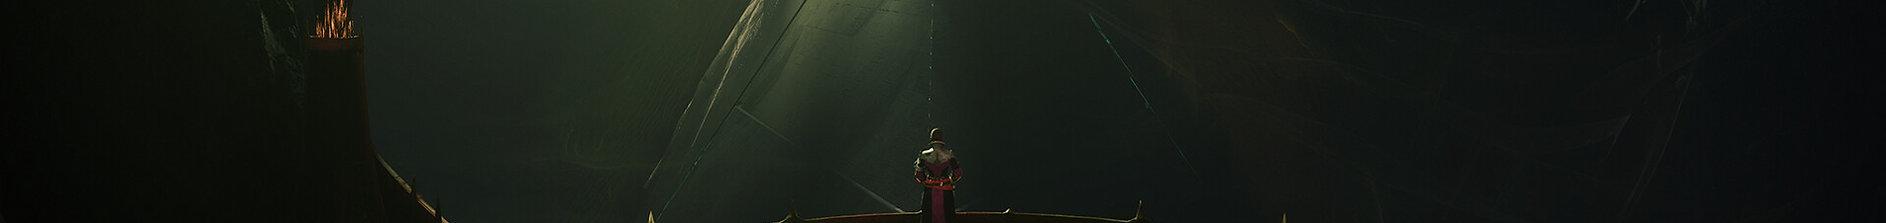 ryan-kamins-shadowkeep-cine-1.jpg